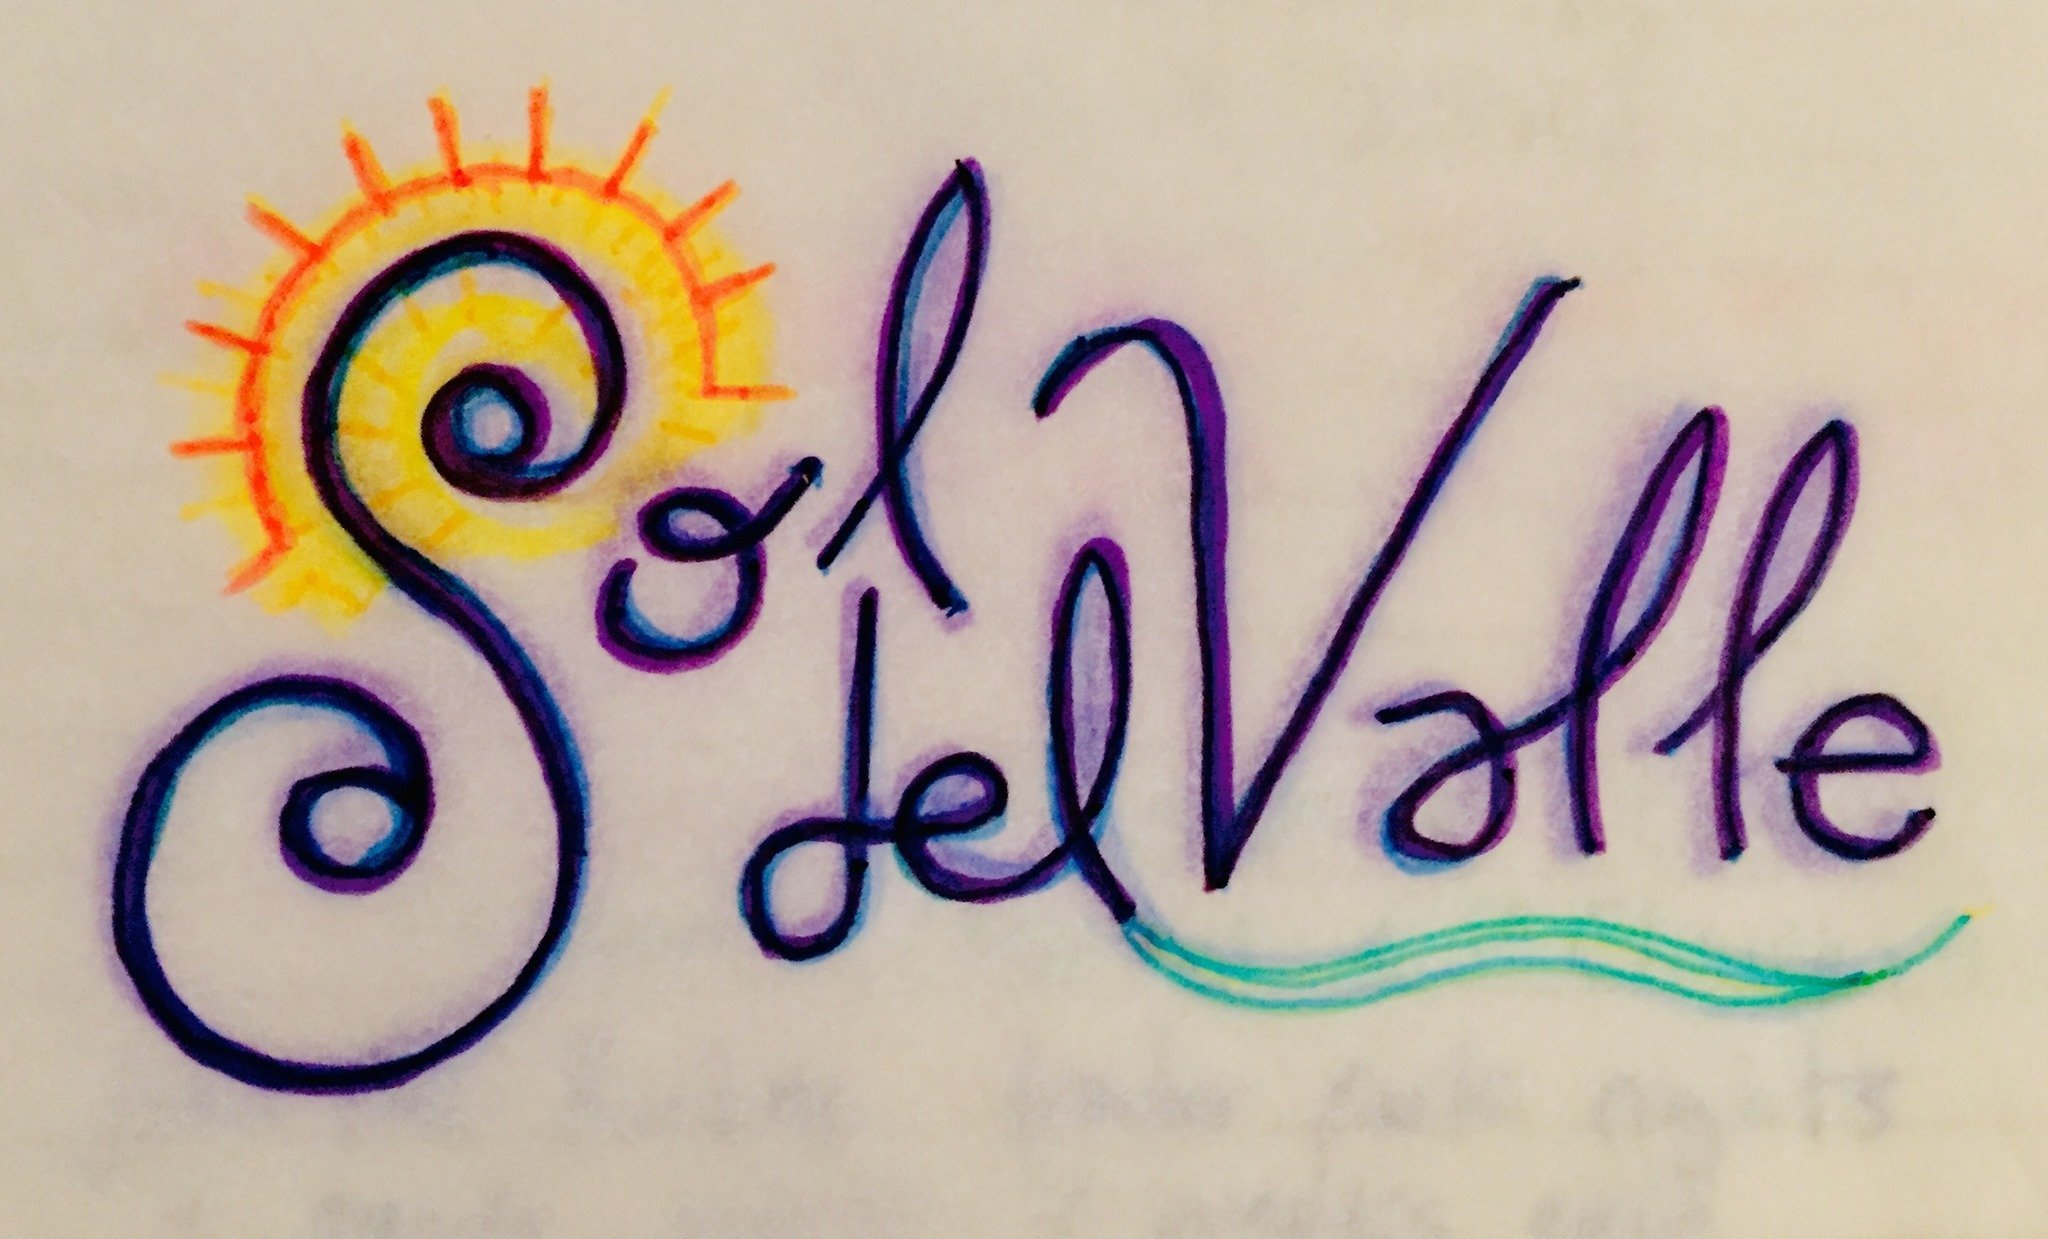 El Sol siga brillando thumbnail